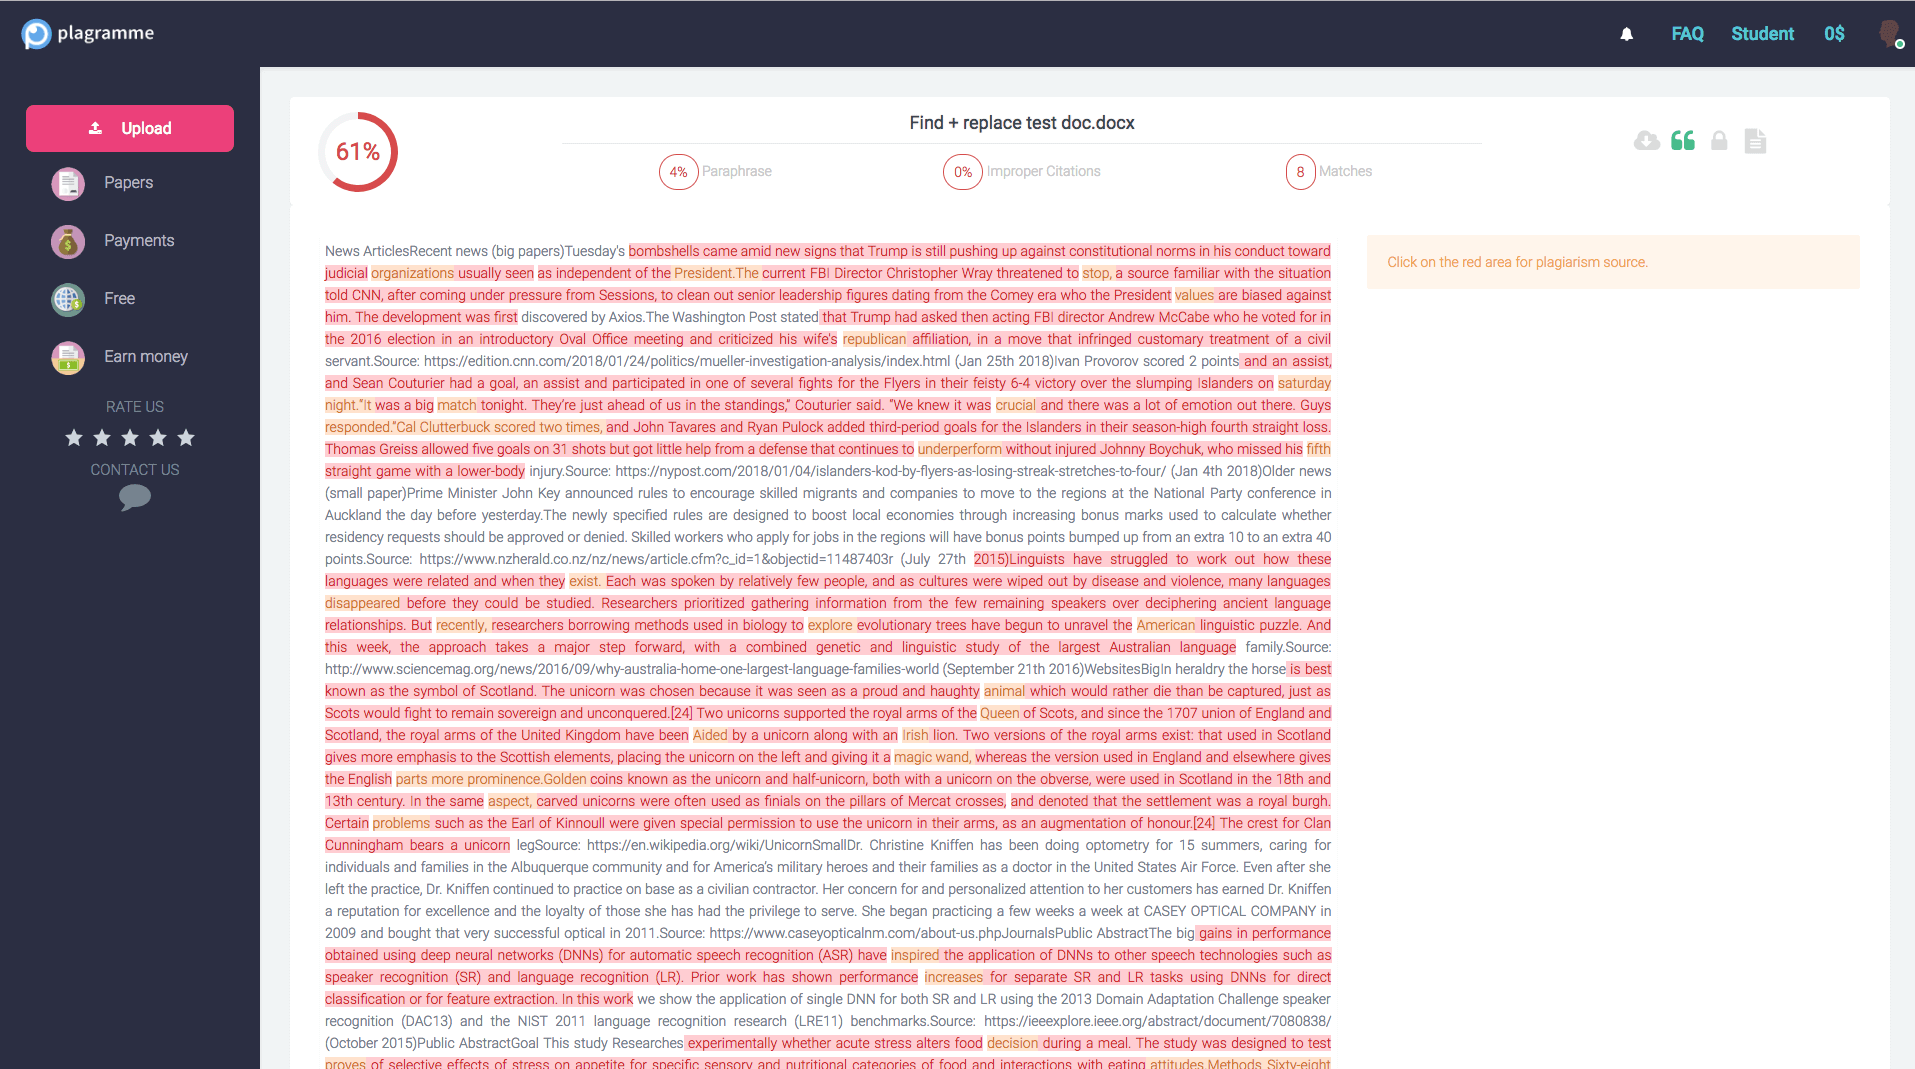 Plagramme Plagiarism Checker report